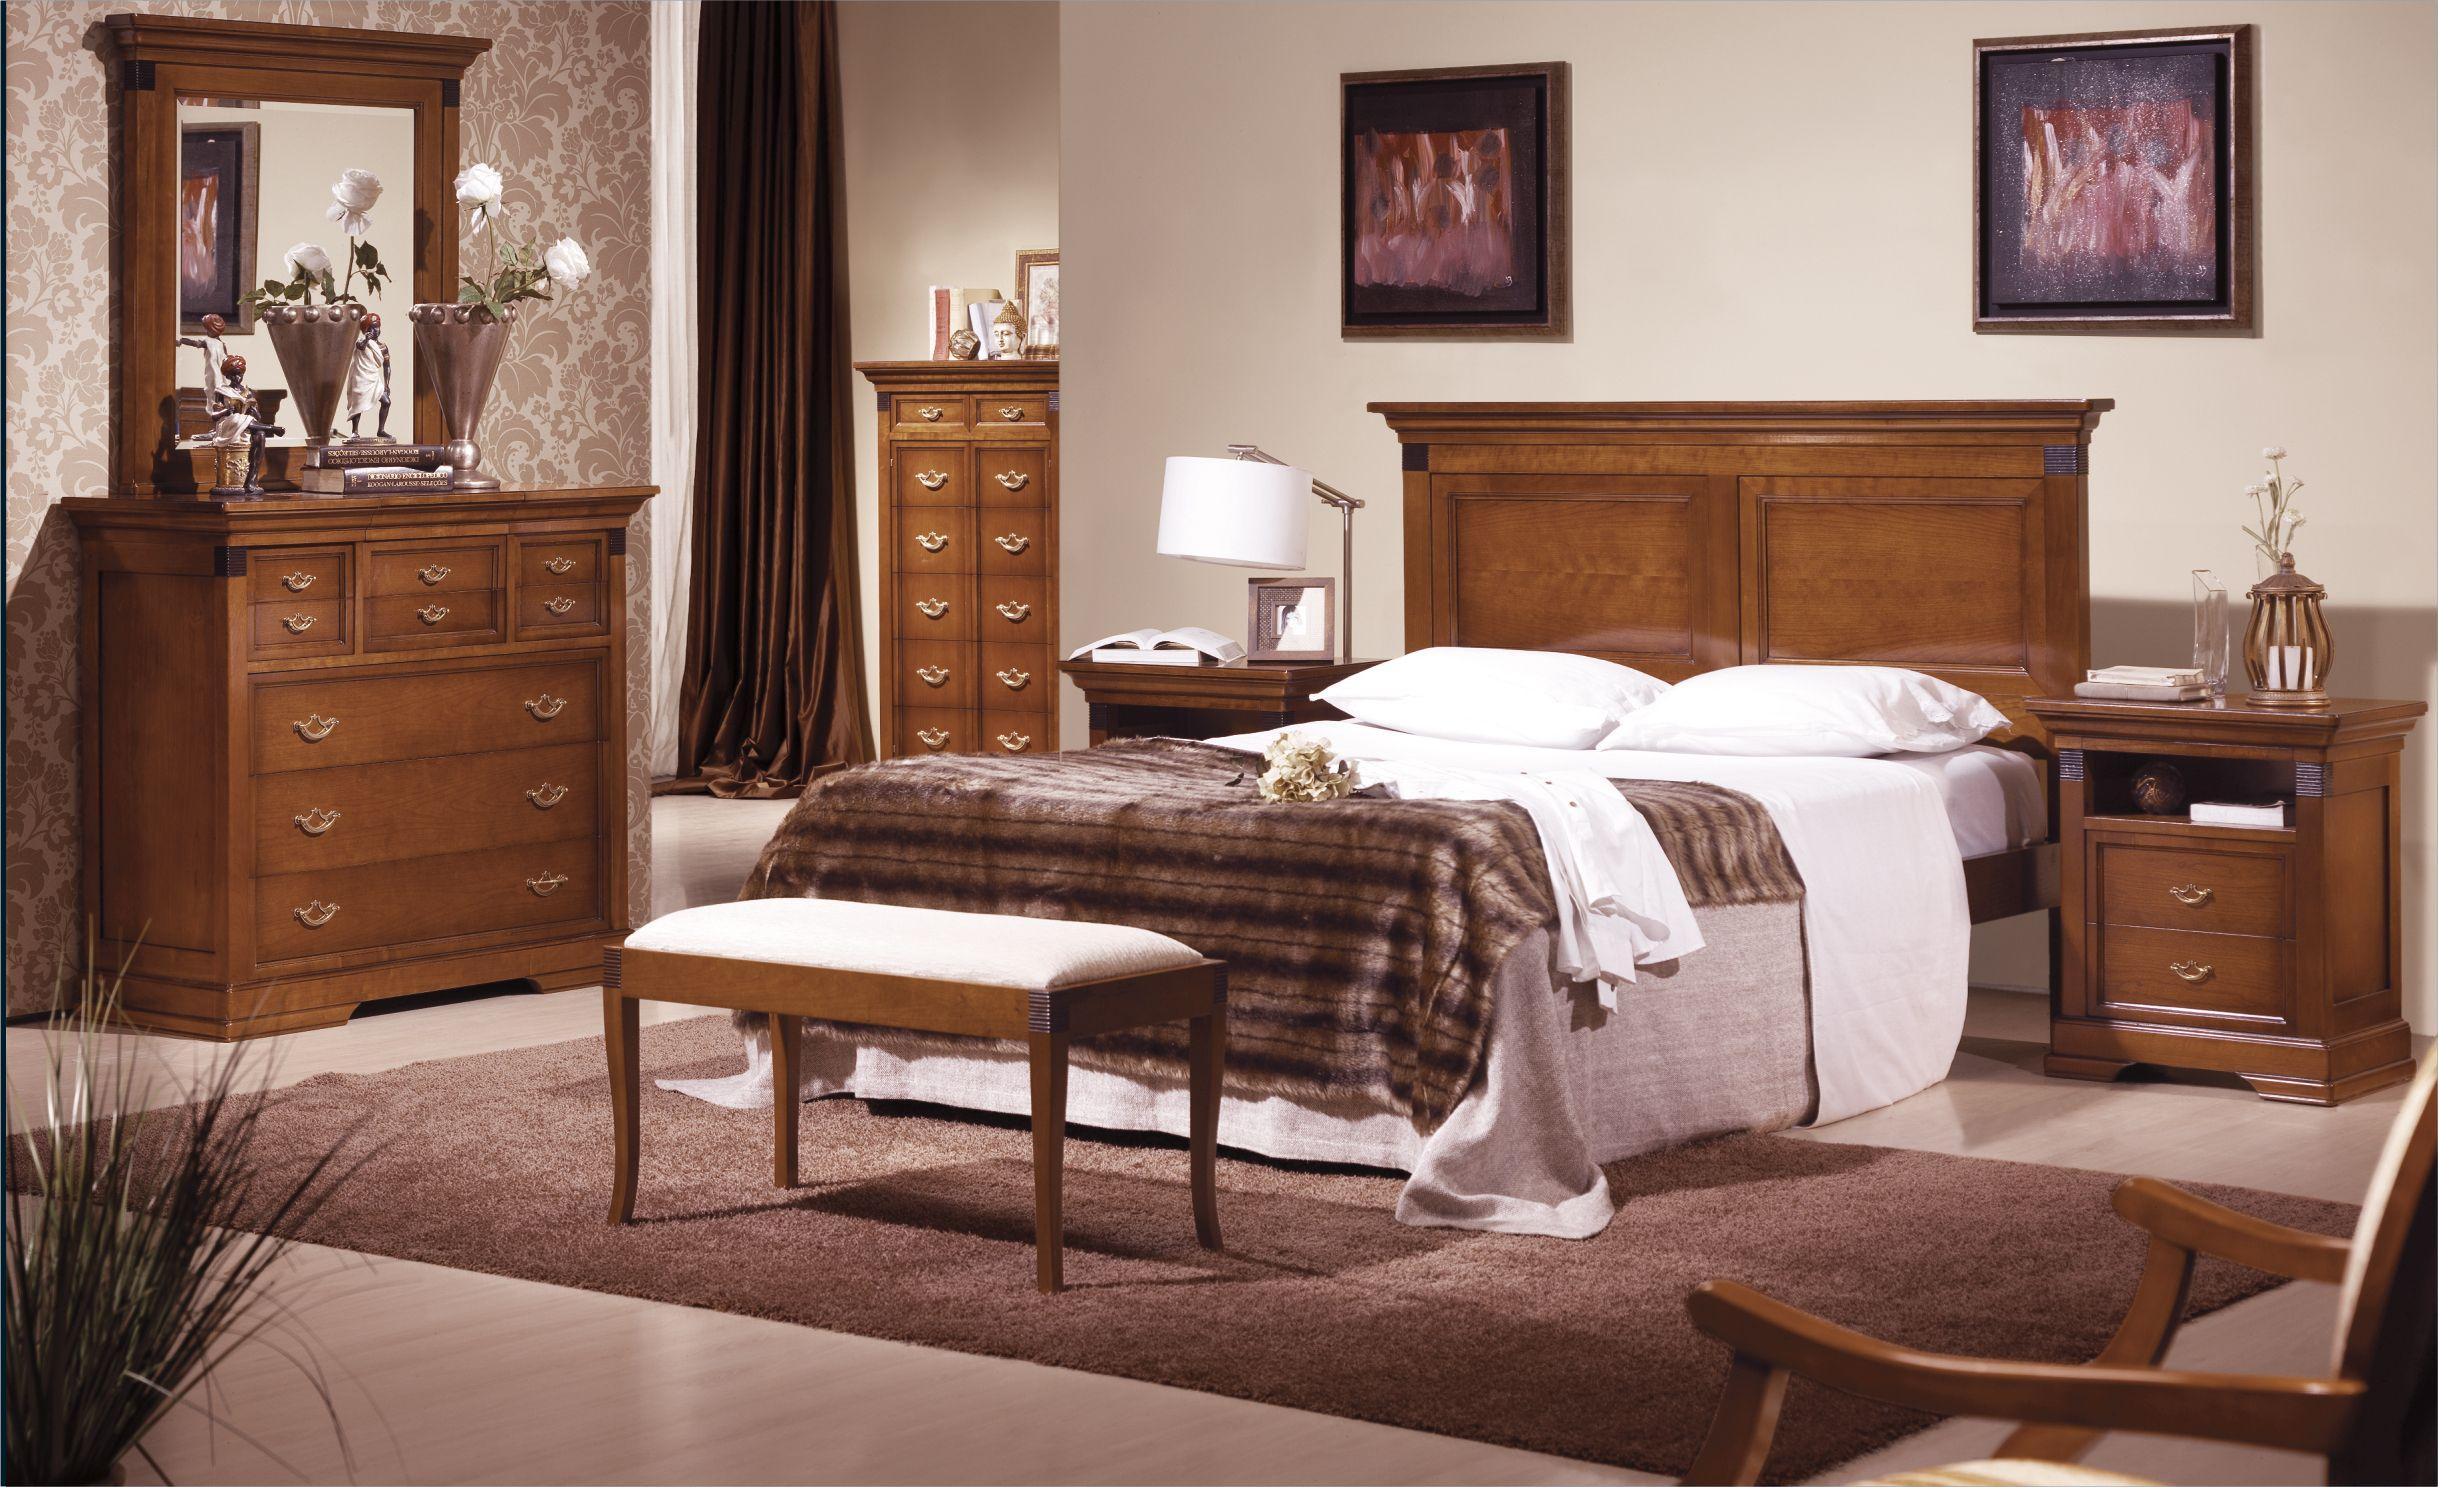 Pin De Hyorin Keng En House Dormitorios Clasicos Dormitorios Muebles